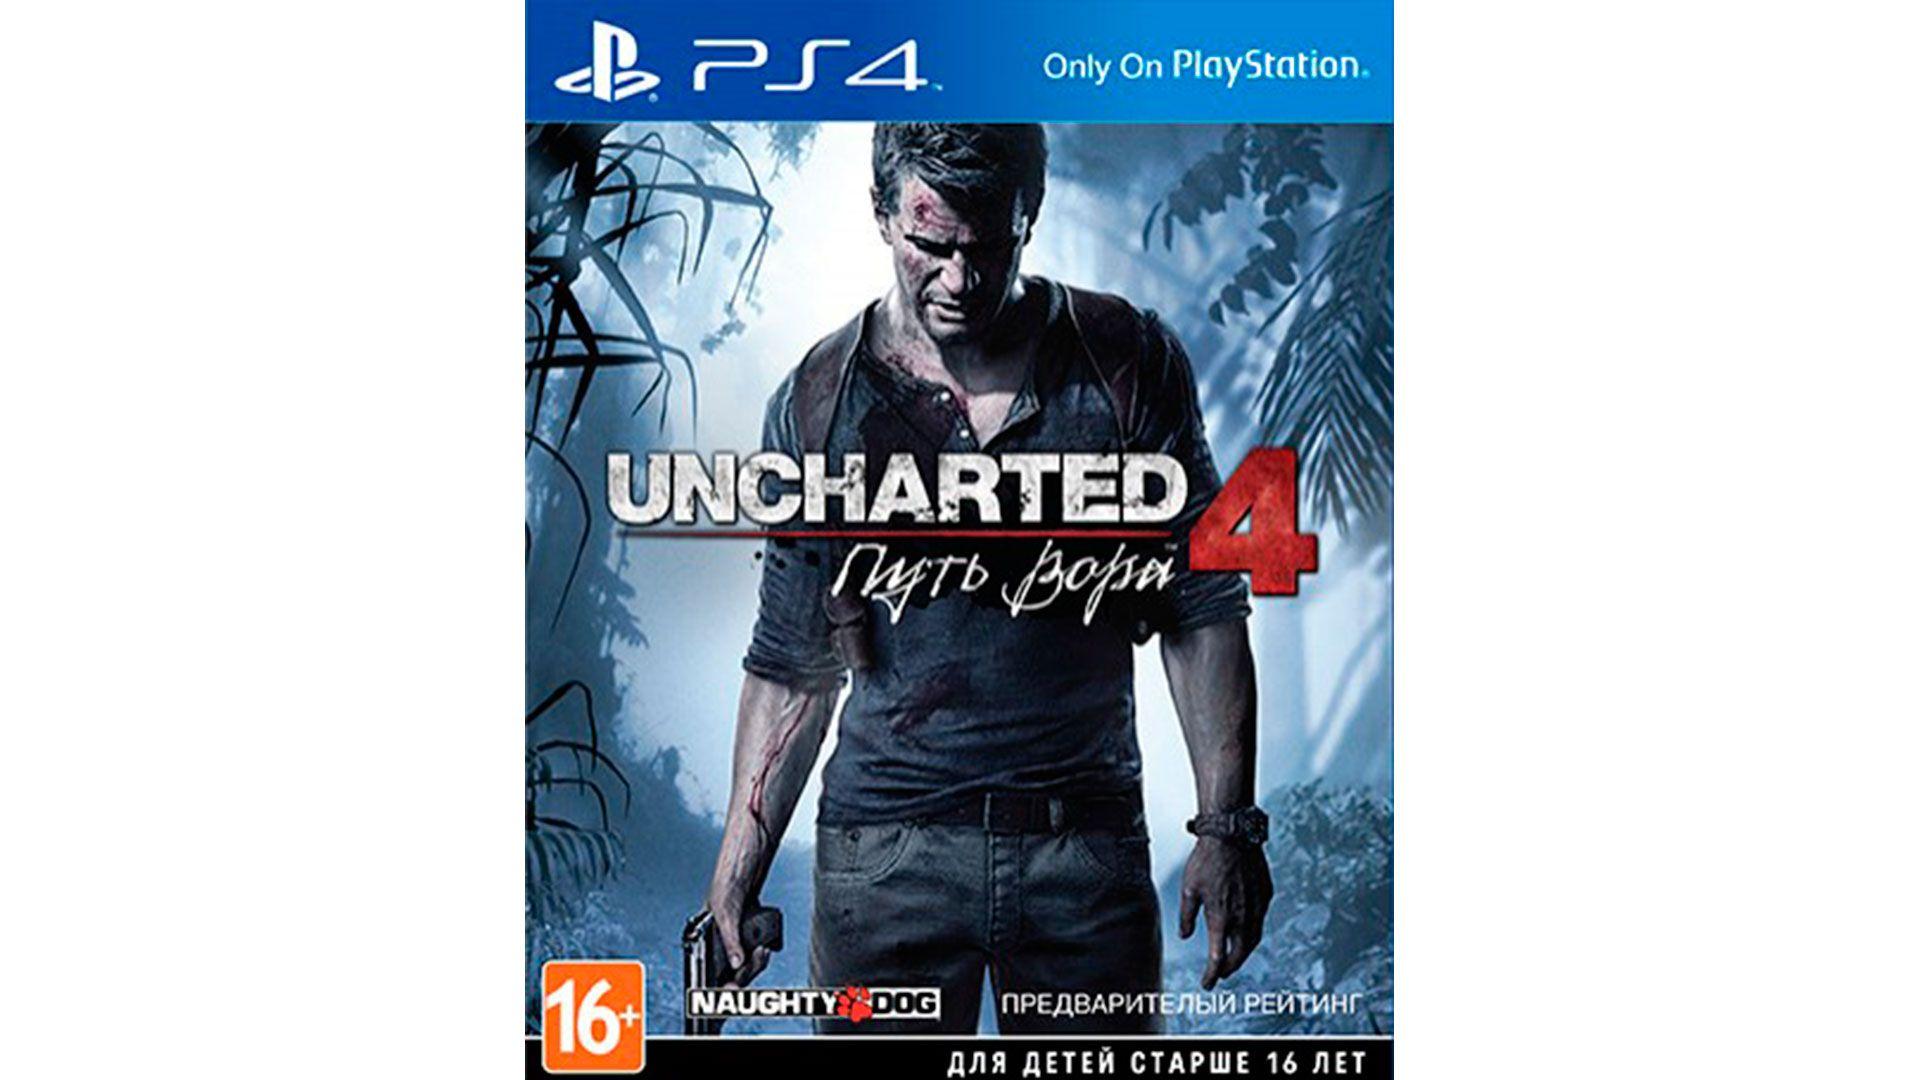 Uncharted 4: Путь вора игра для Sony PlayStation 4 [PS4U4]